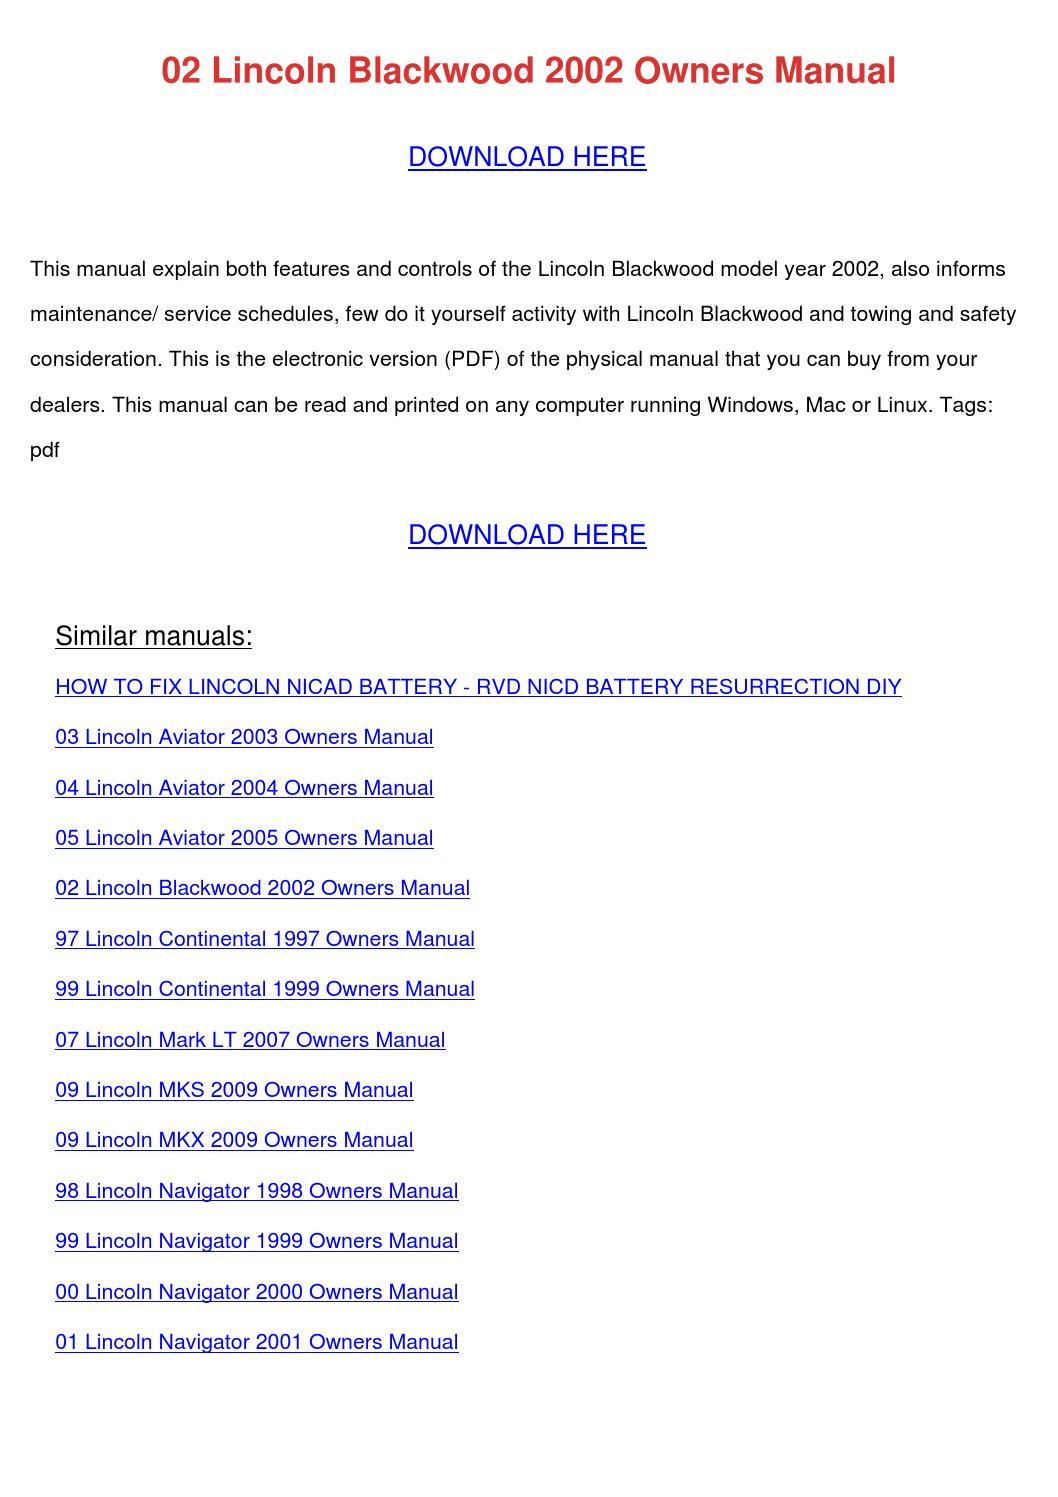 02 Lincoln Blackwood 2002 Owners Manual By Tomokostott Issuu